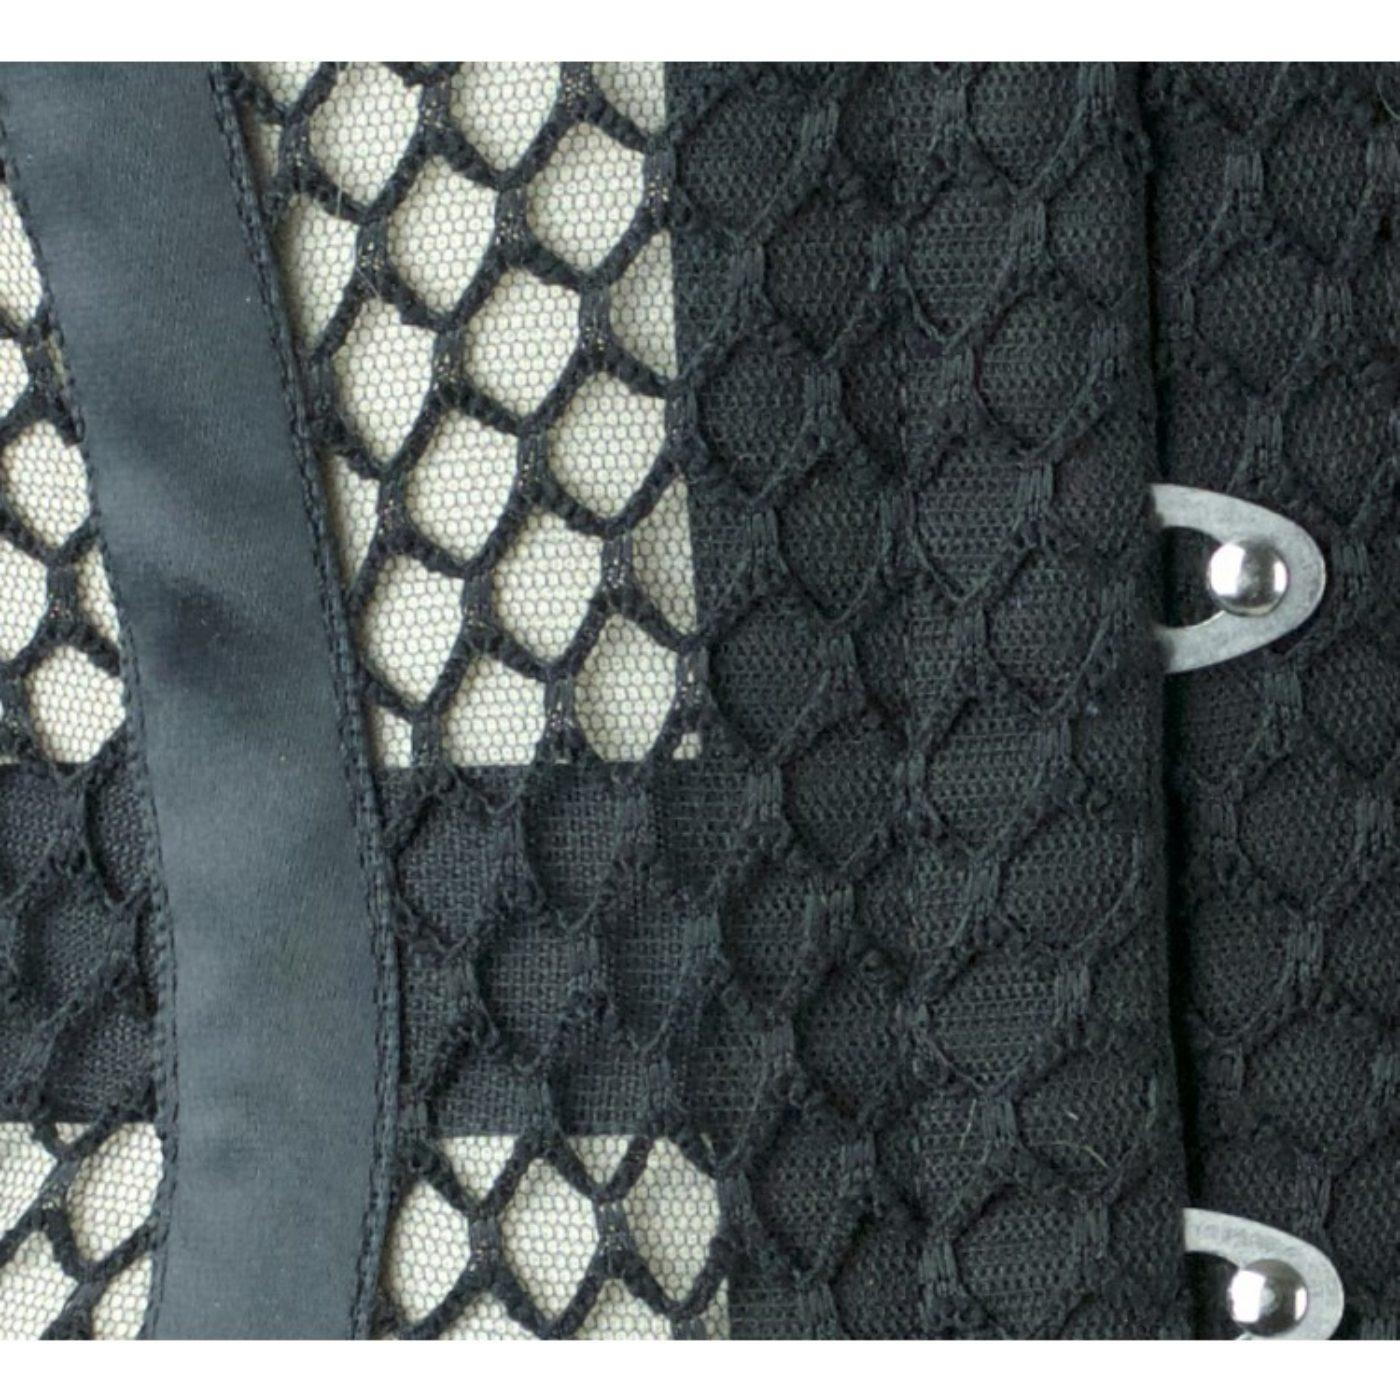 Close up black mesh image